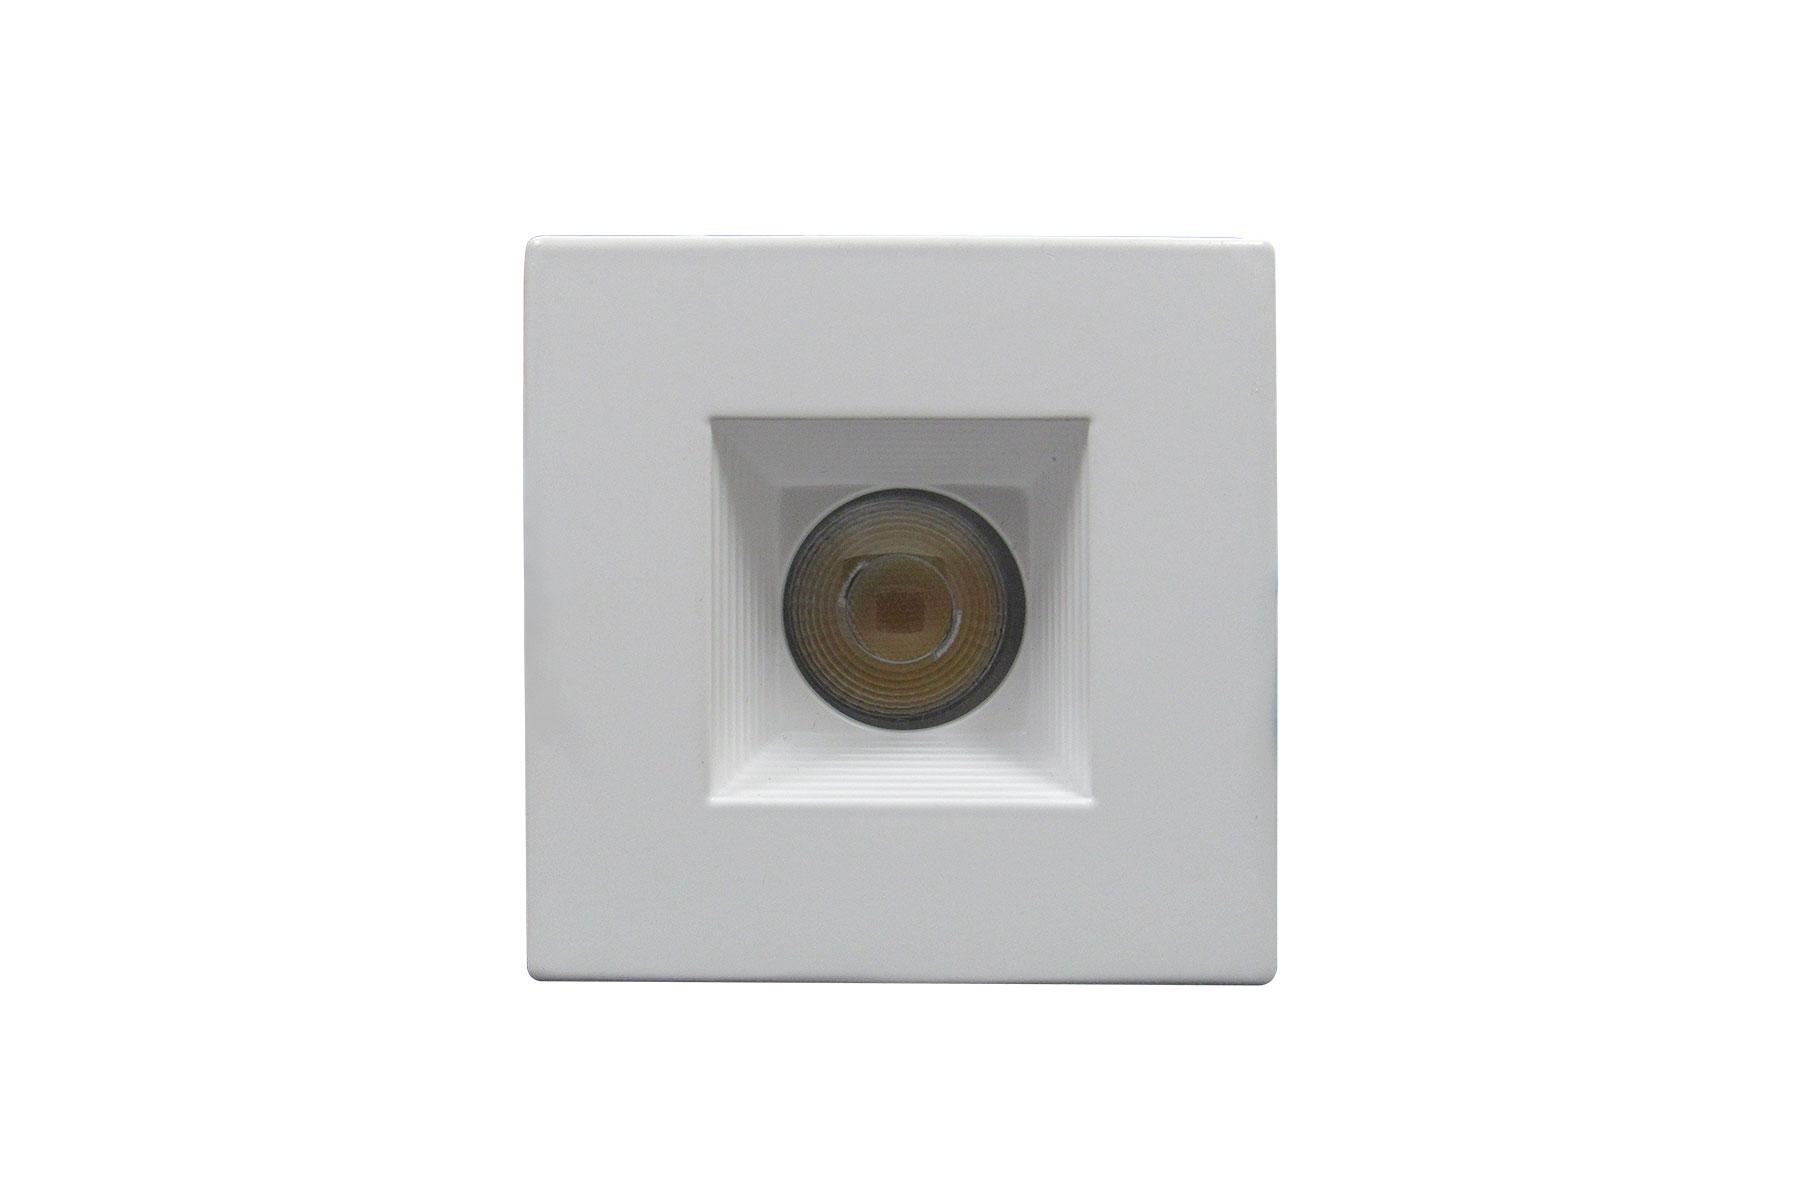 Square-Baffle-Recessed-Light-White